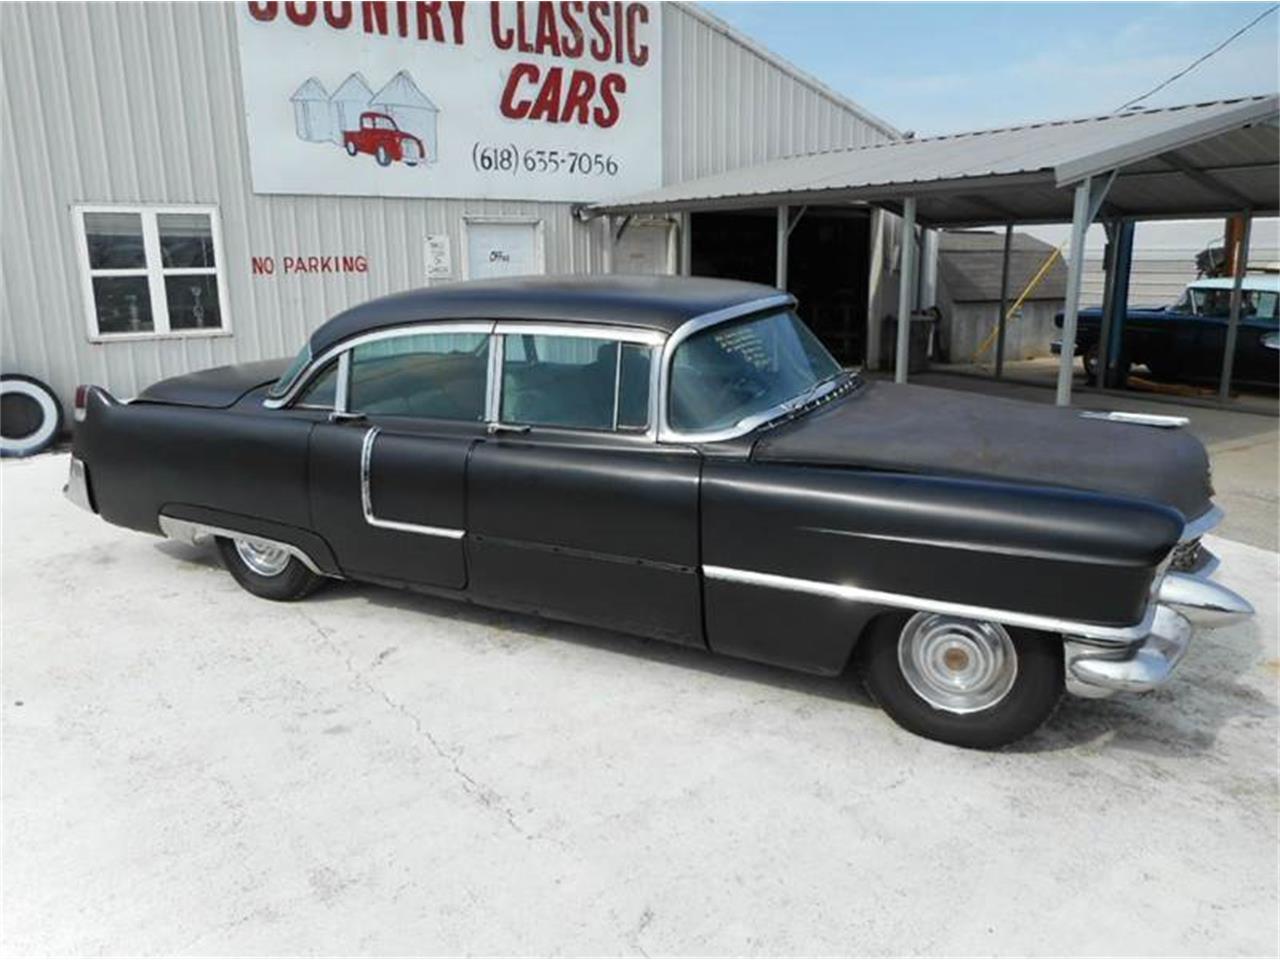 1955 Cadillac 4-Dr Sedan (CC-974883) for sale in Staunton, Illinois